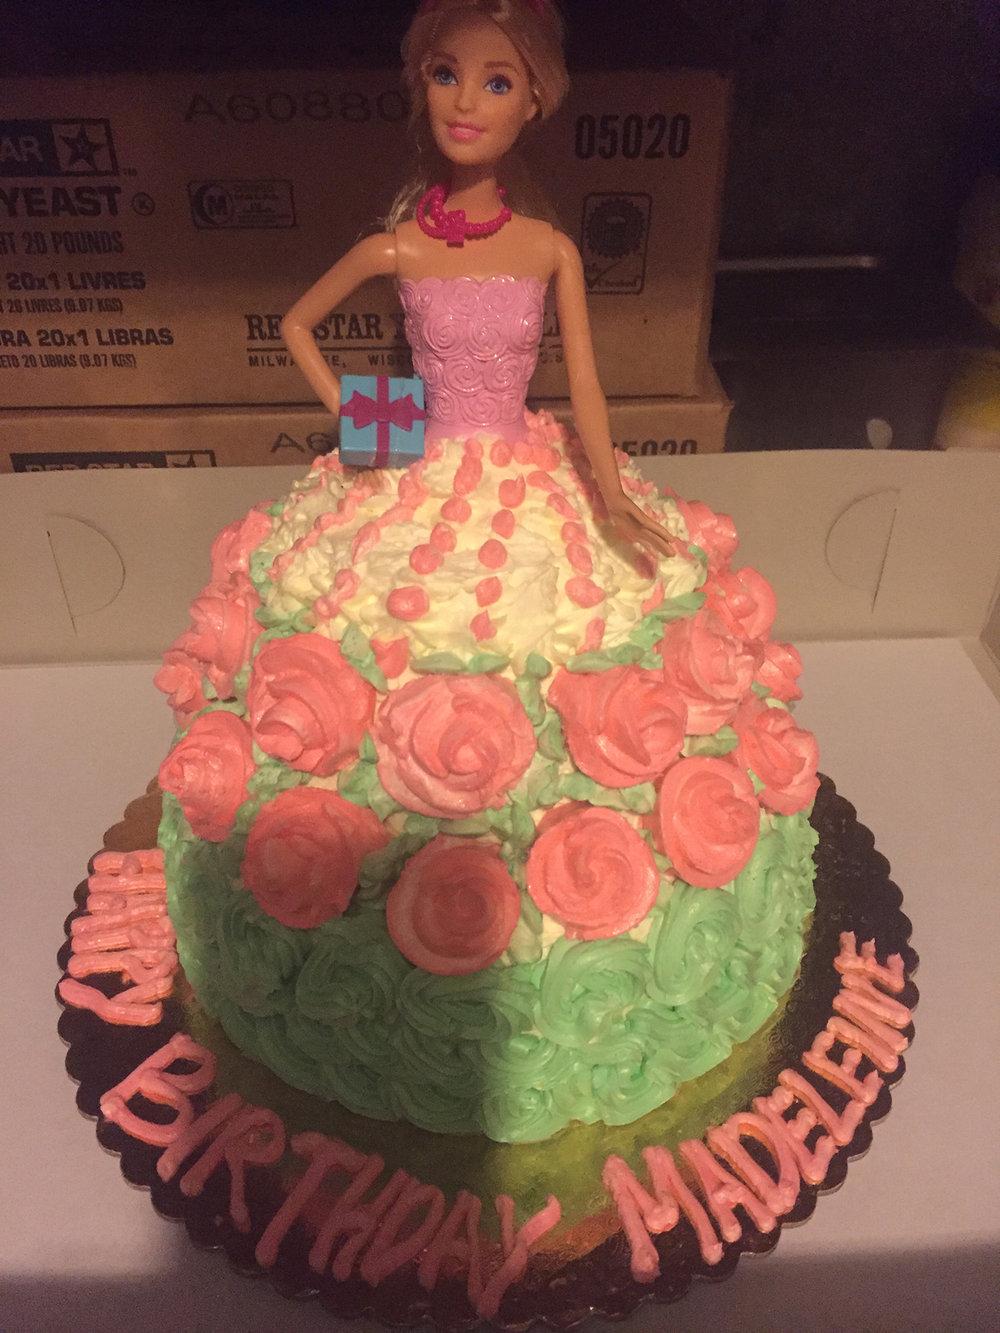 barbie-birthday-cake-hmb-bakery.jpg